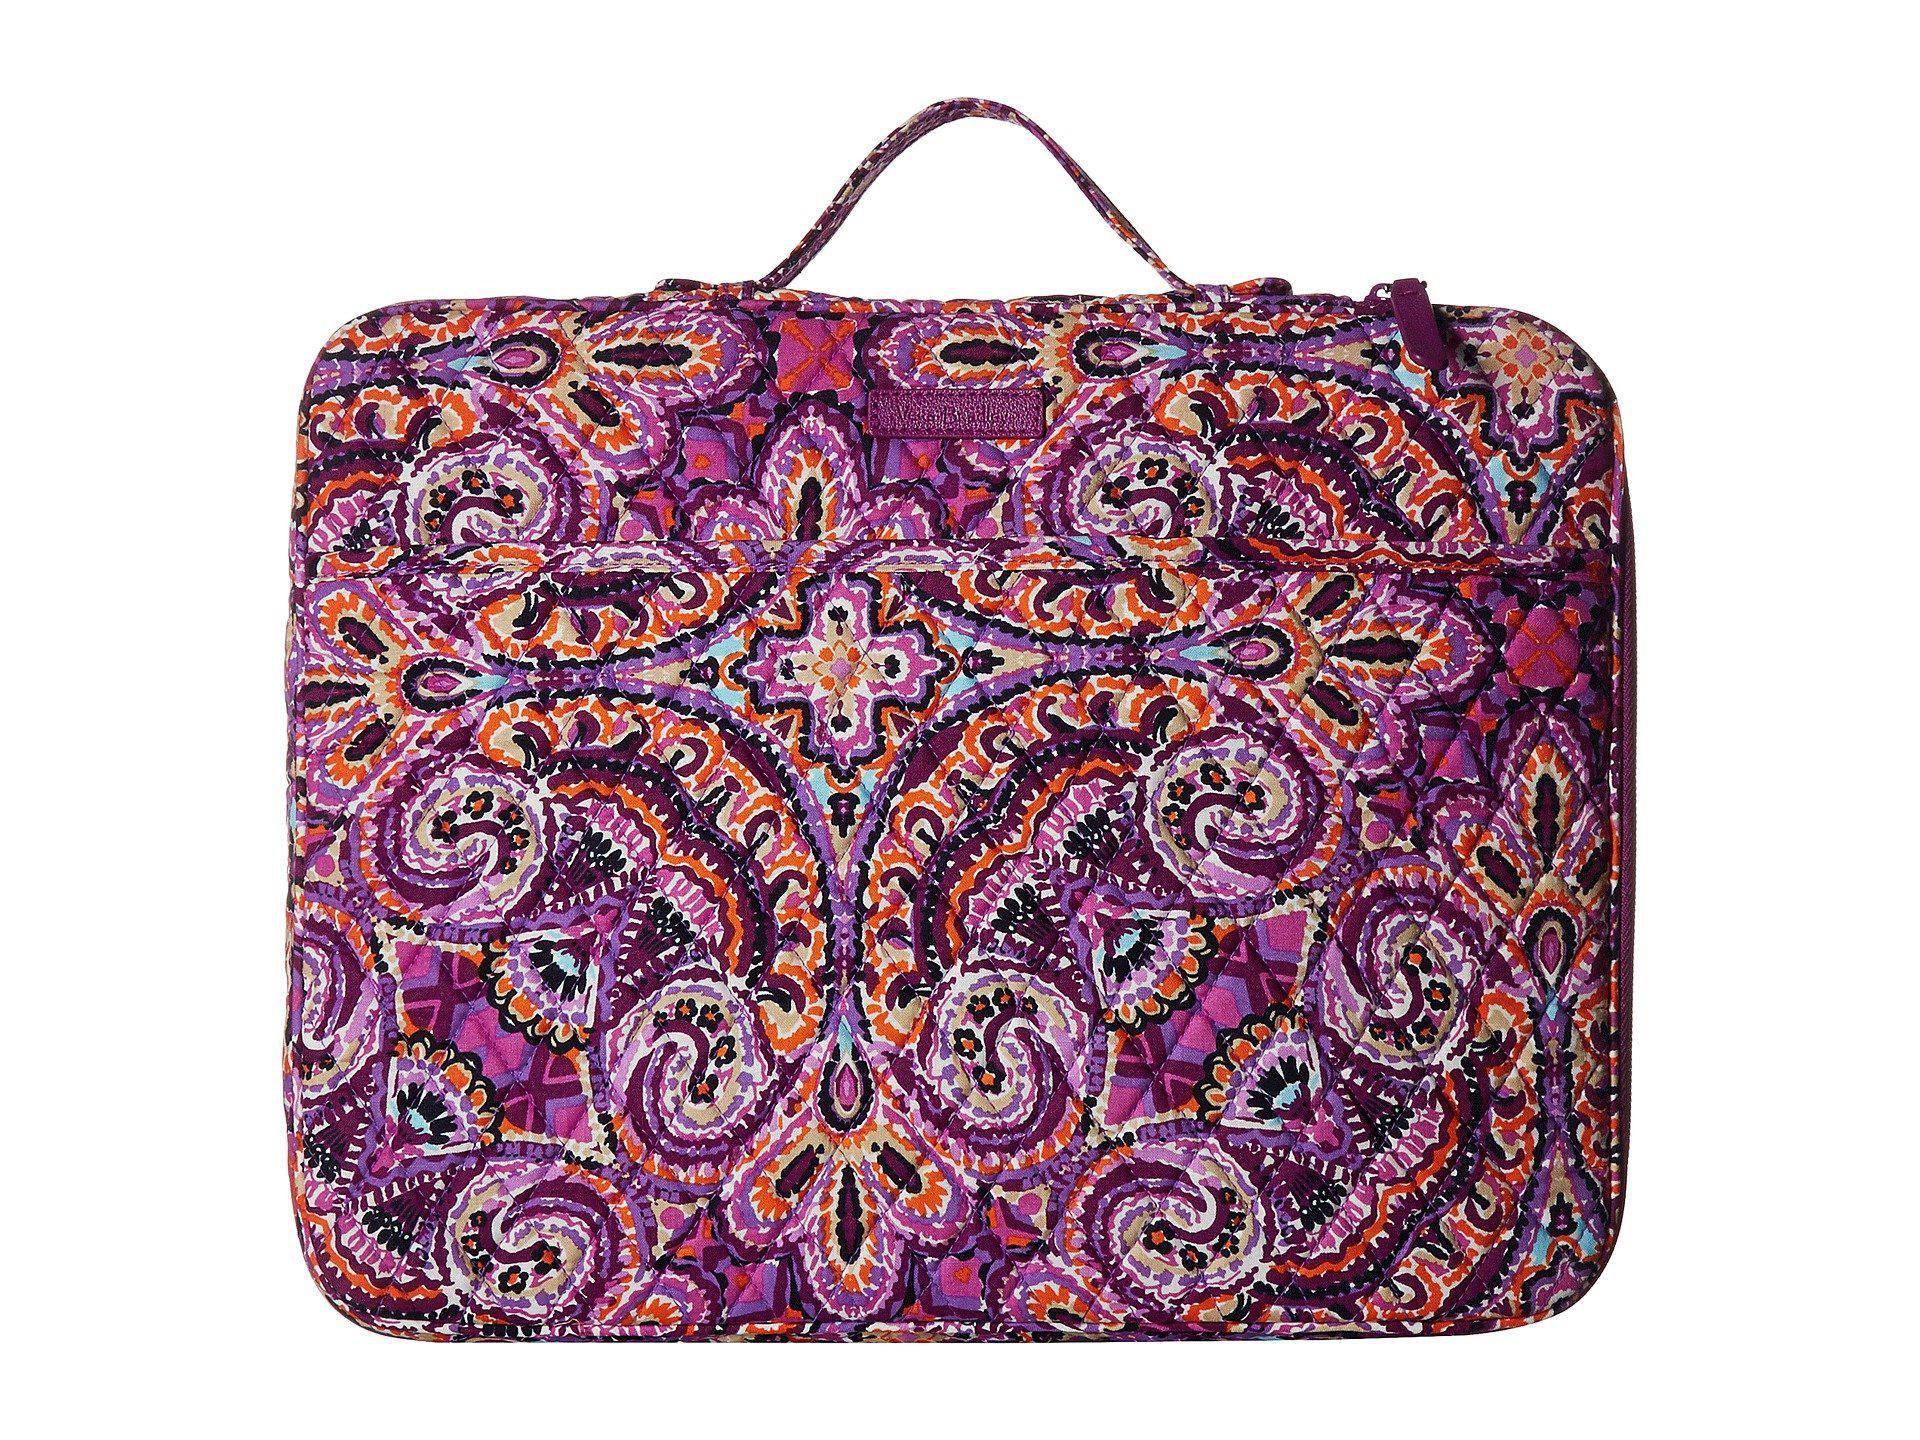 Vera Bradley Laptop Bag Black Image Collections Amgimage Co